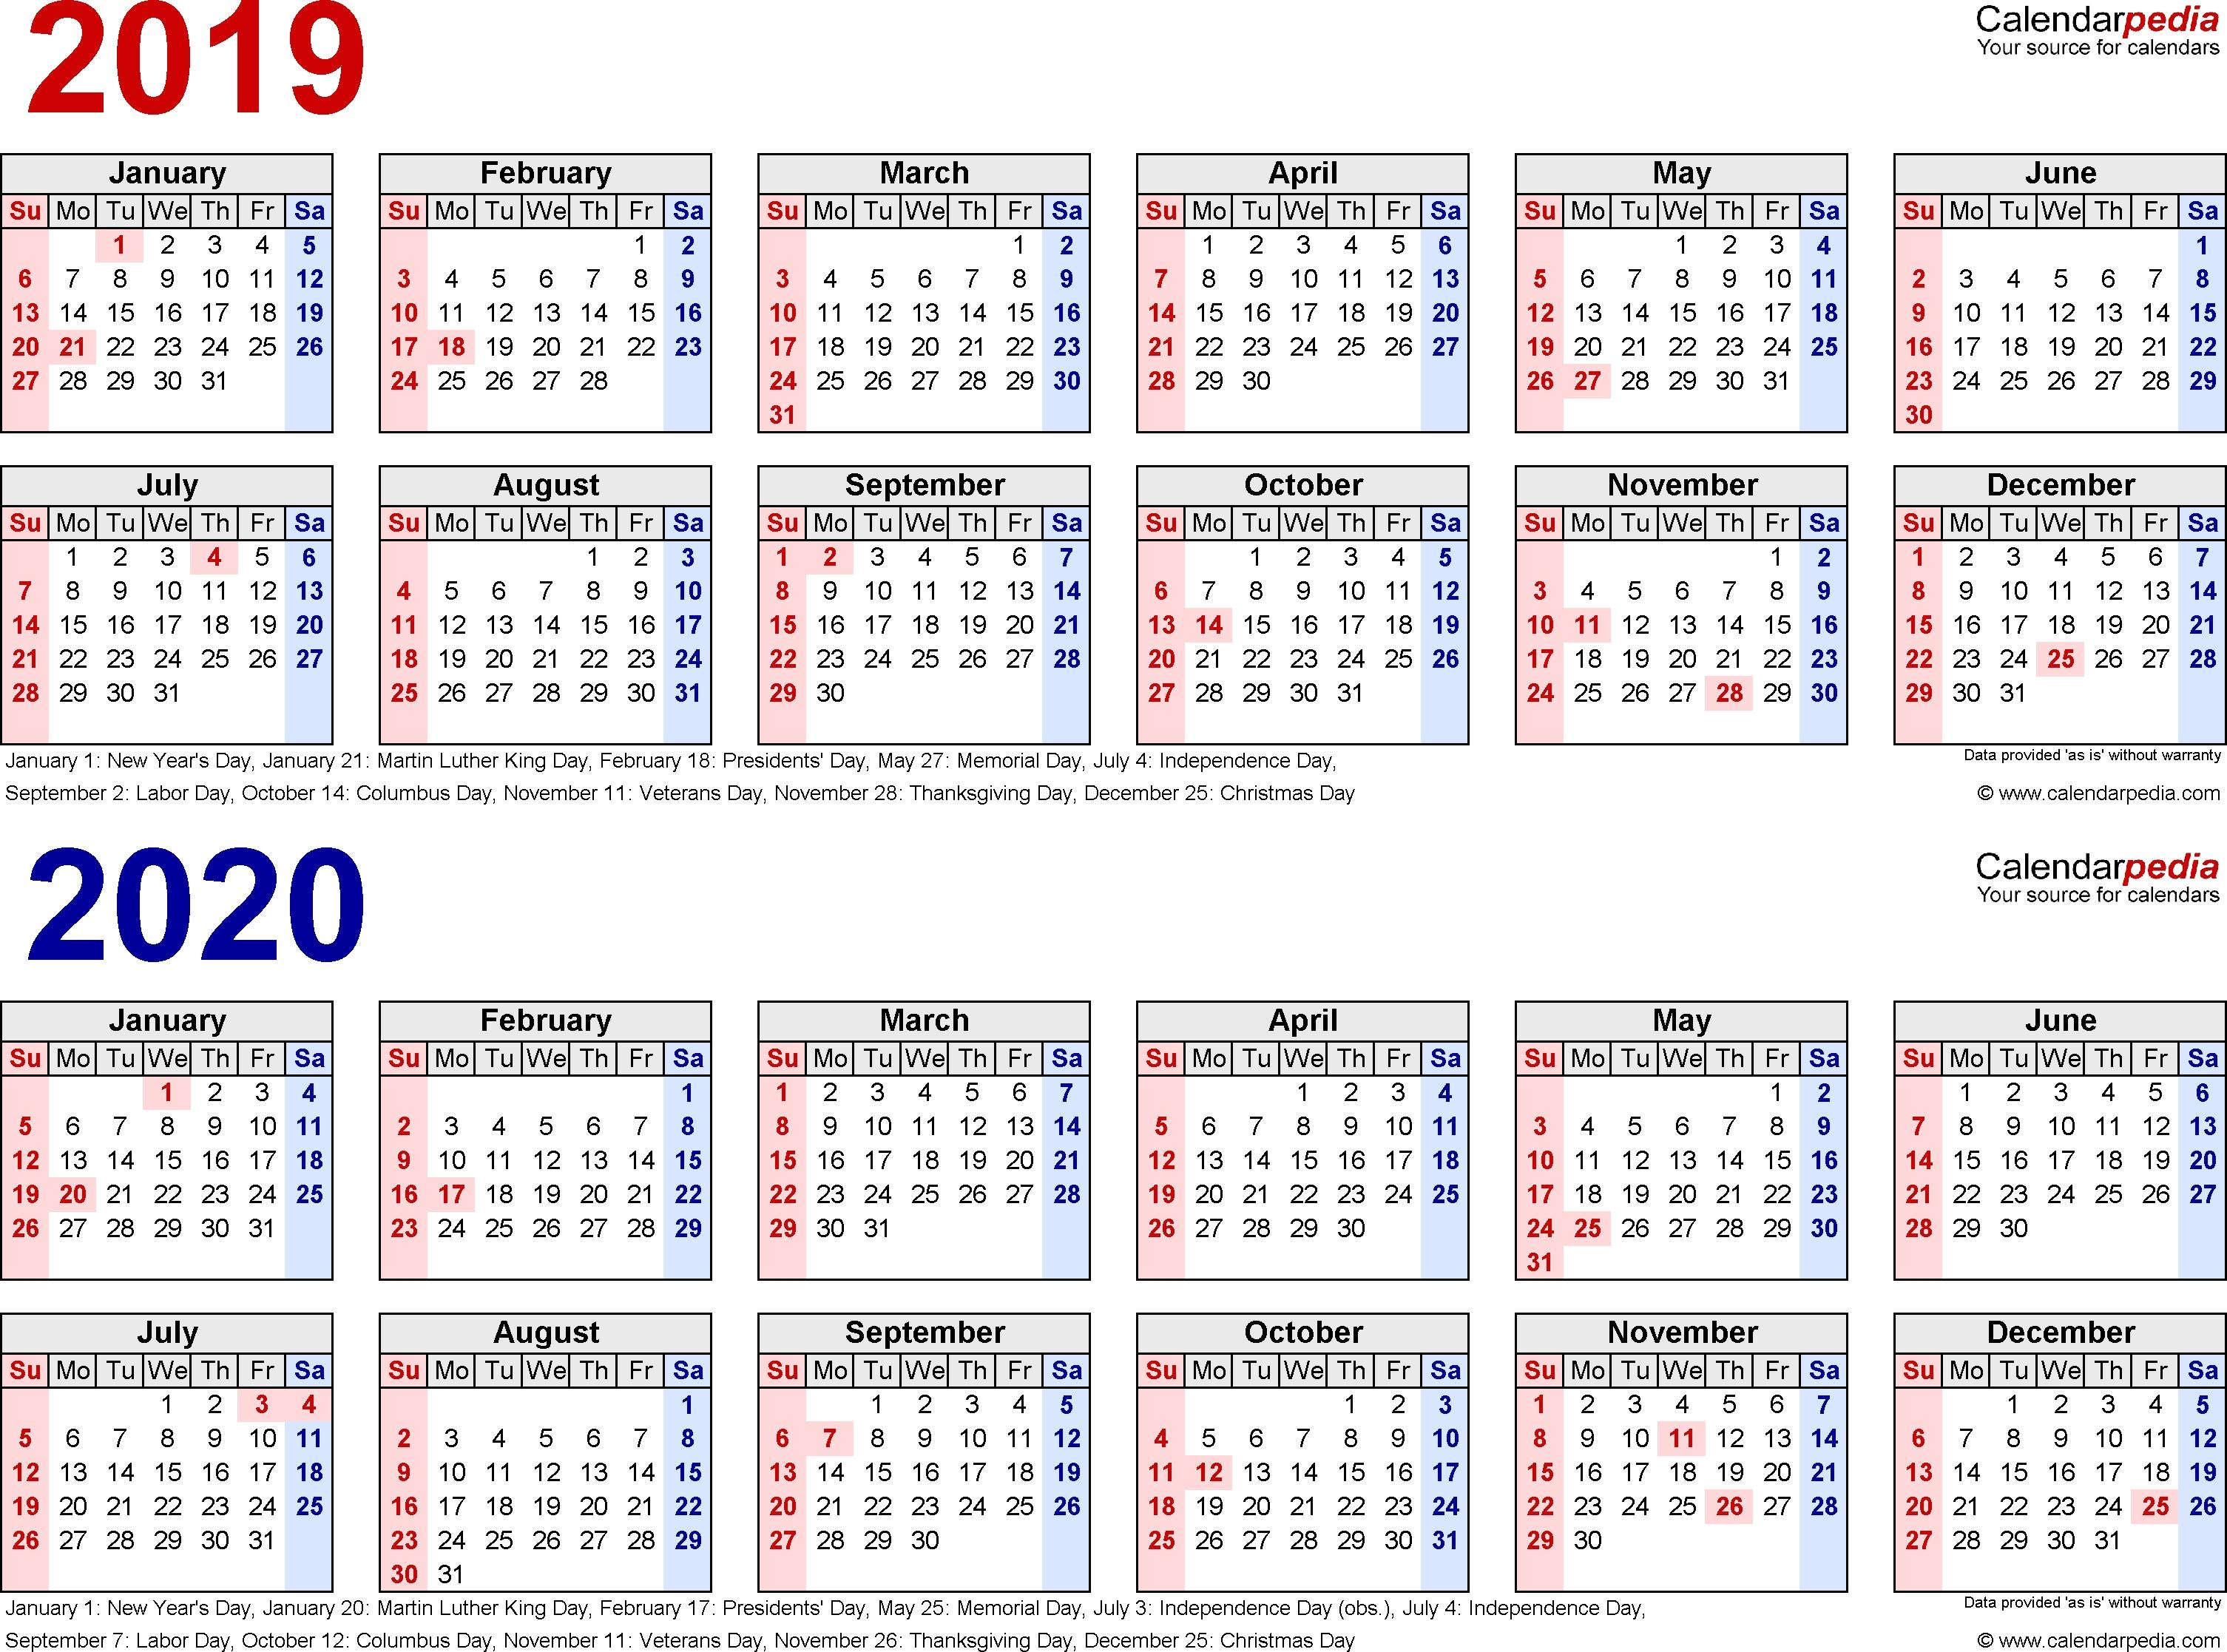 2019-2020 Calendar - Free Printable Two-Year Word Calendars regarding Calendar To Type On 2019 - 2020